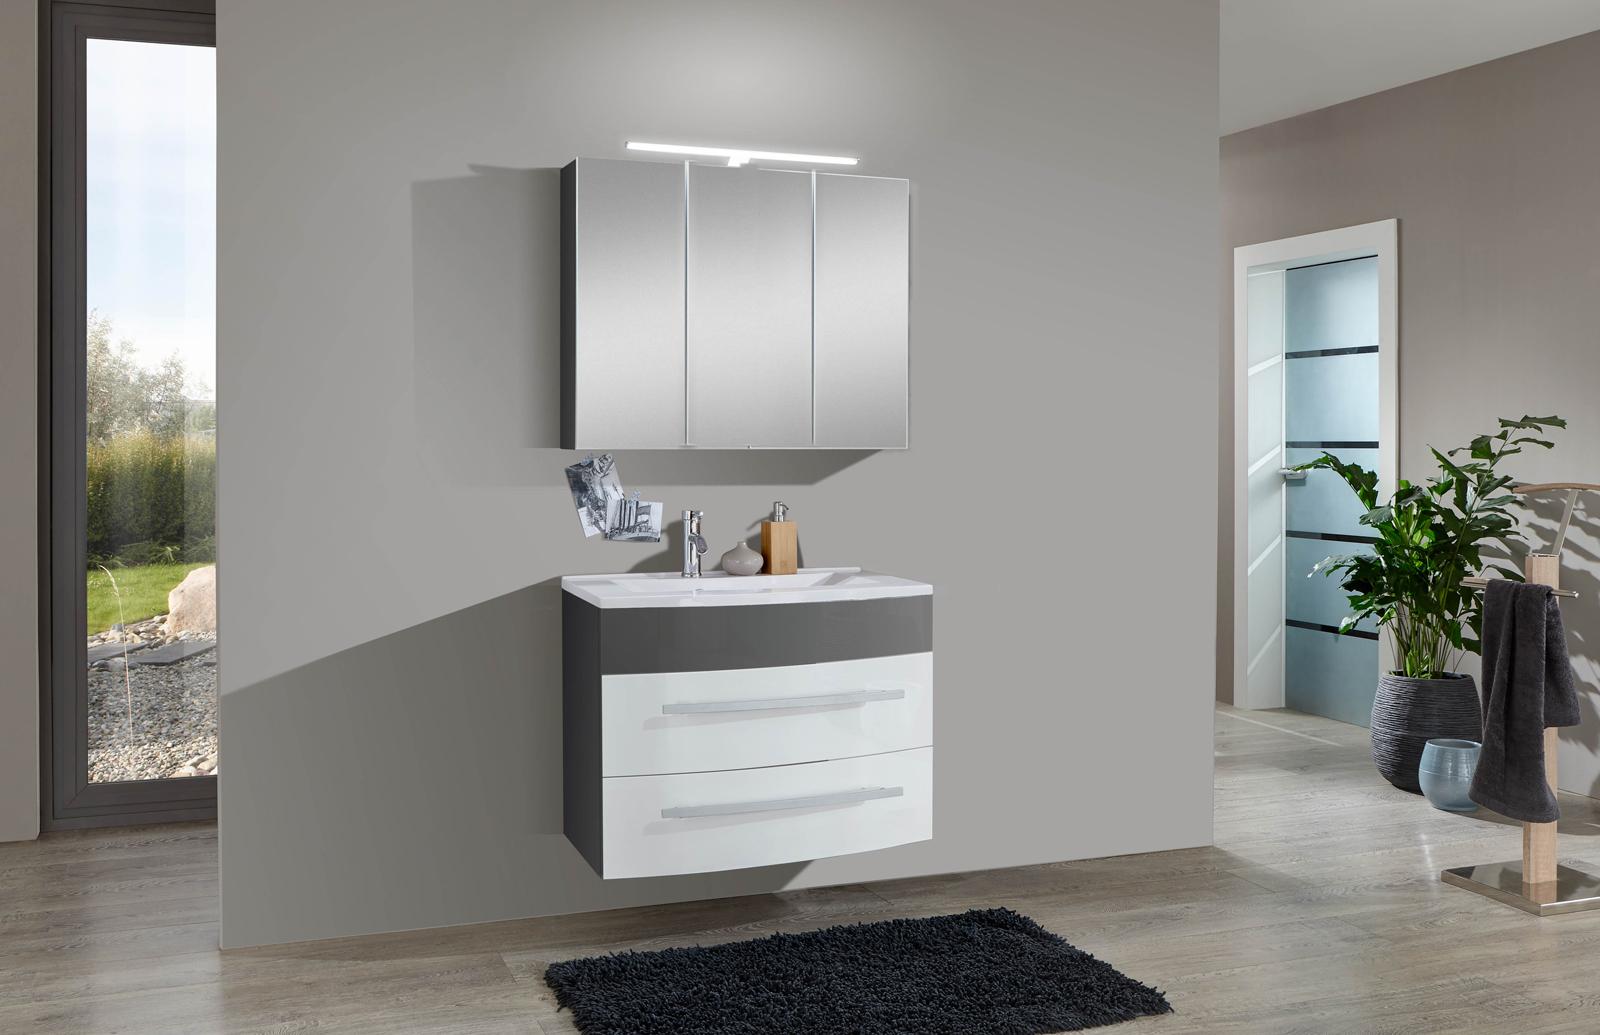 sam 2tlg badezimmer set hochglanz wei grau 70cm genf. Black Bedroom Furniture Sets. Home Design Ideas